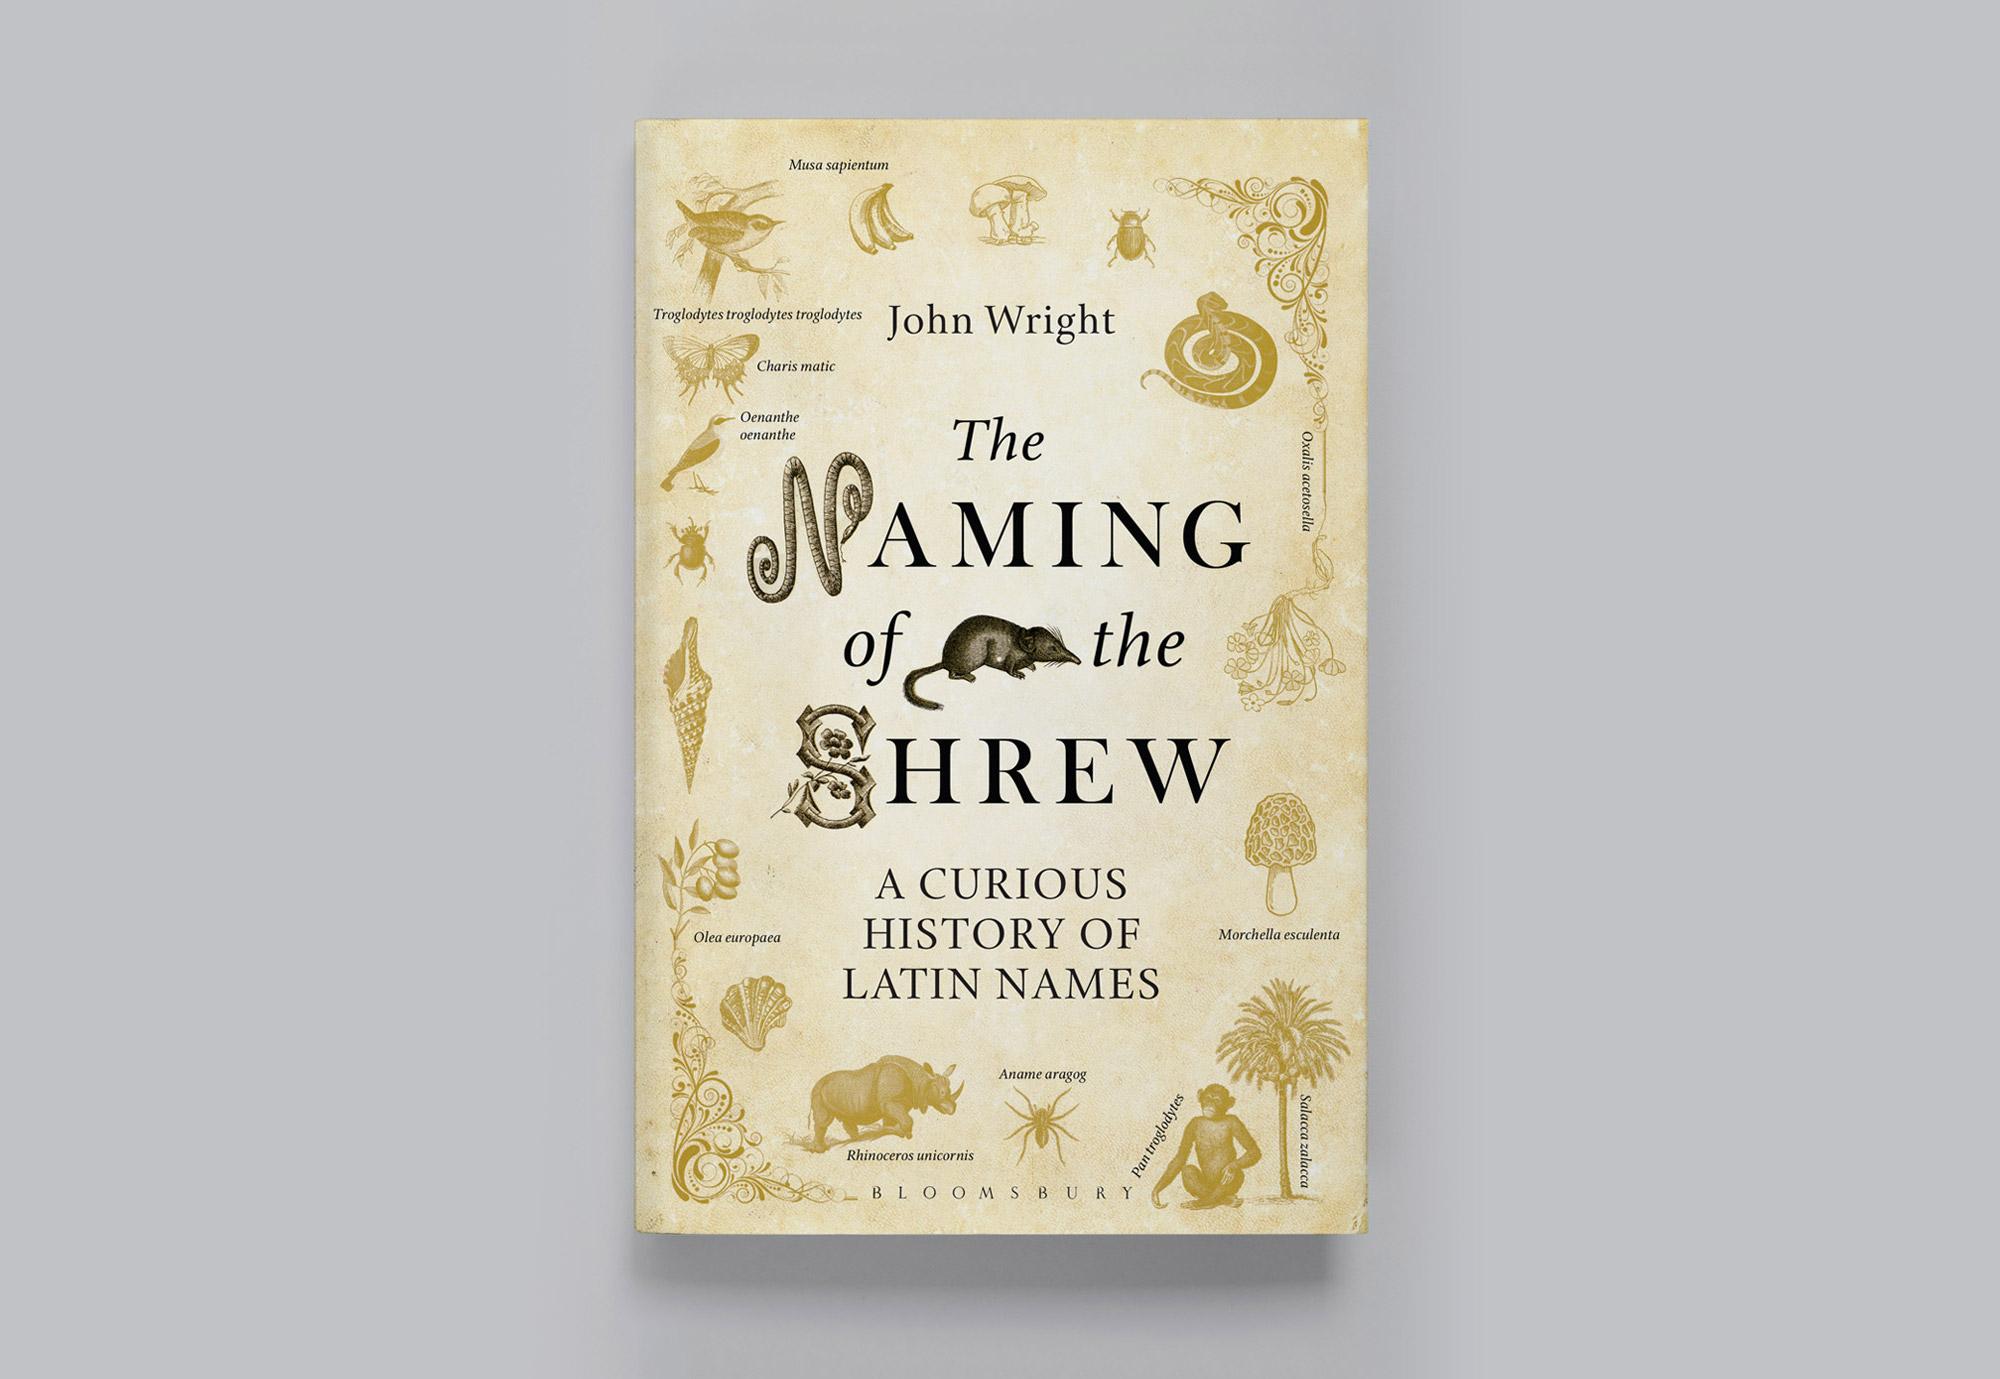 shrew-1.jpg